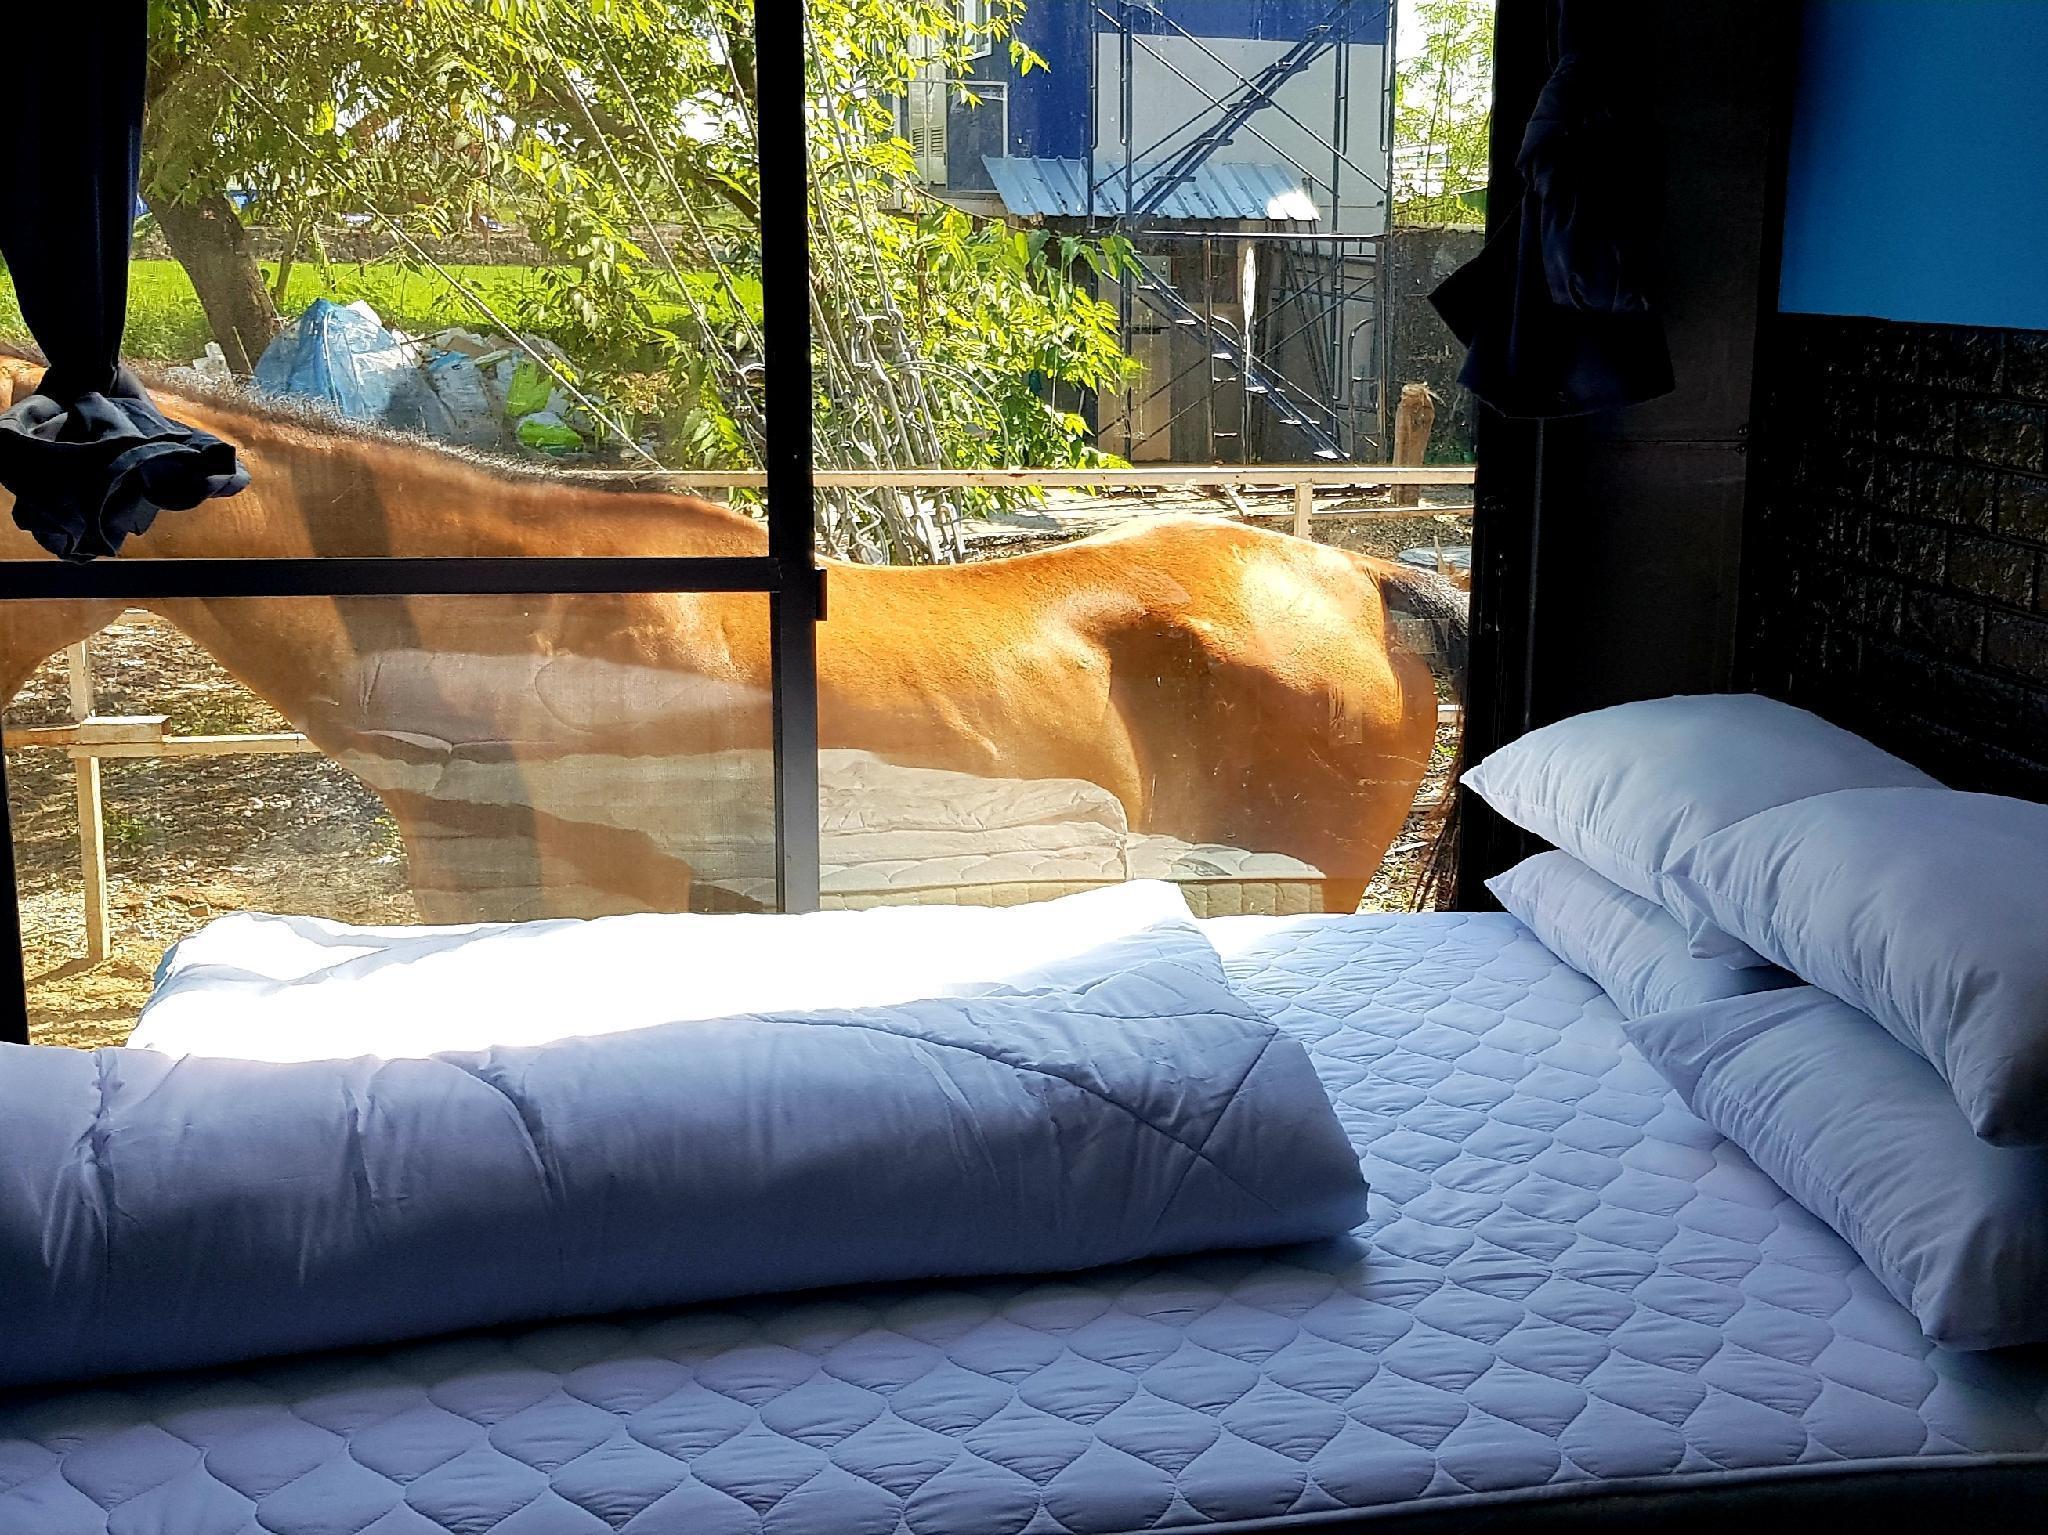 RODEO HOUSE BKK Exclusive Queen BED DMK Airport อพาร์ตเมนต์ 1 ห้องนอน 1 ห้องน้ำส่วนตัว ขนาด 18 ตร.ม. – สนามบินนานาชาติดอนเมือง